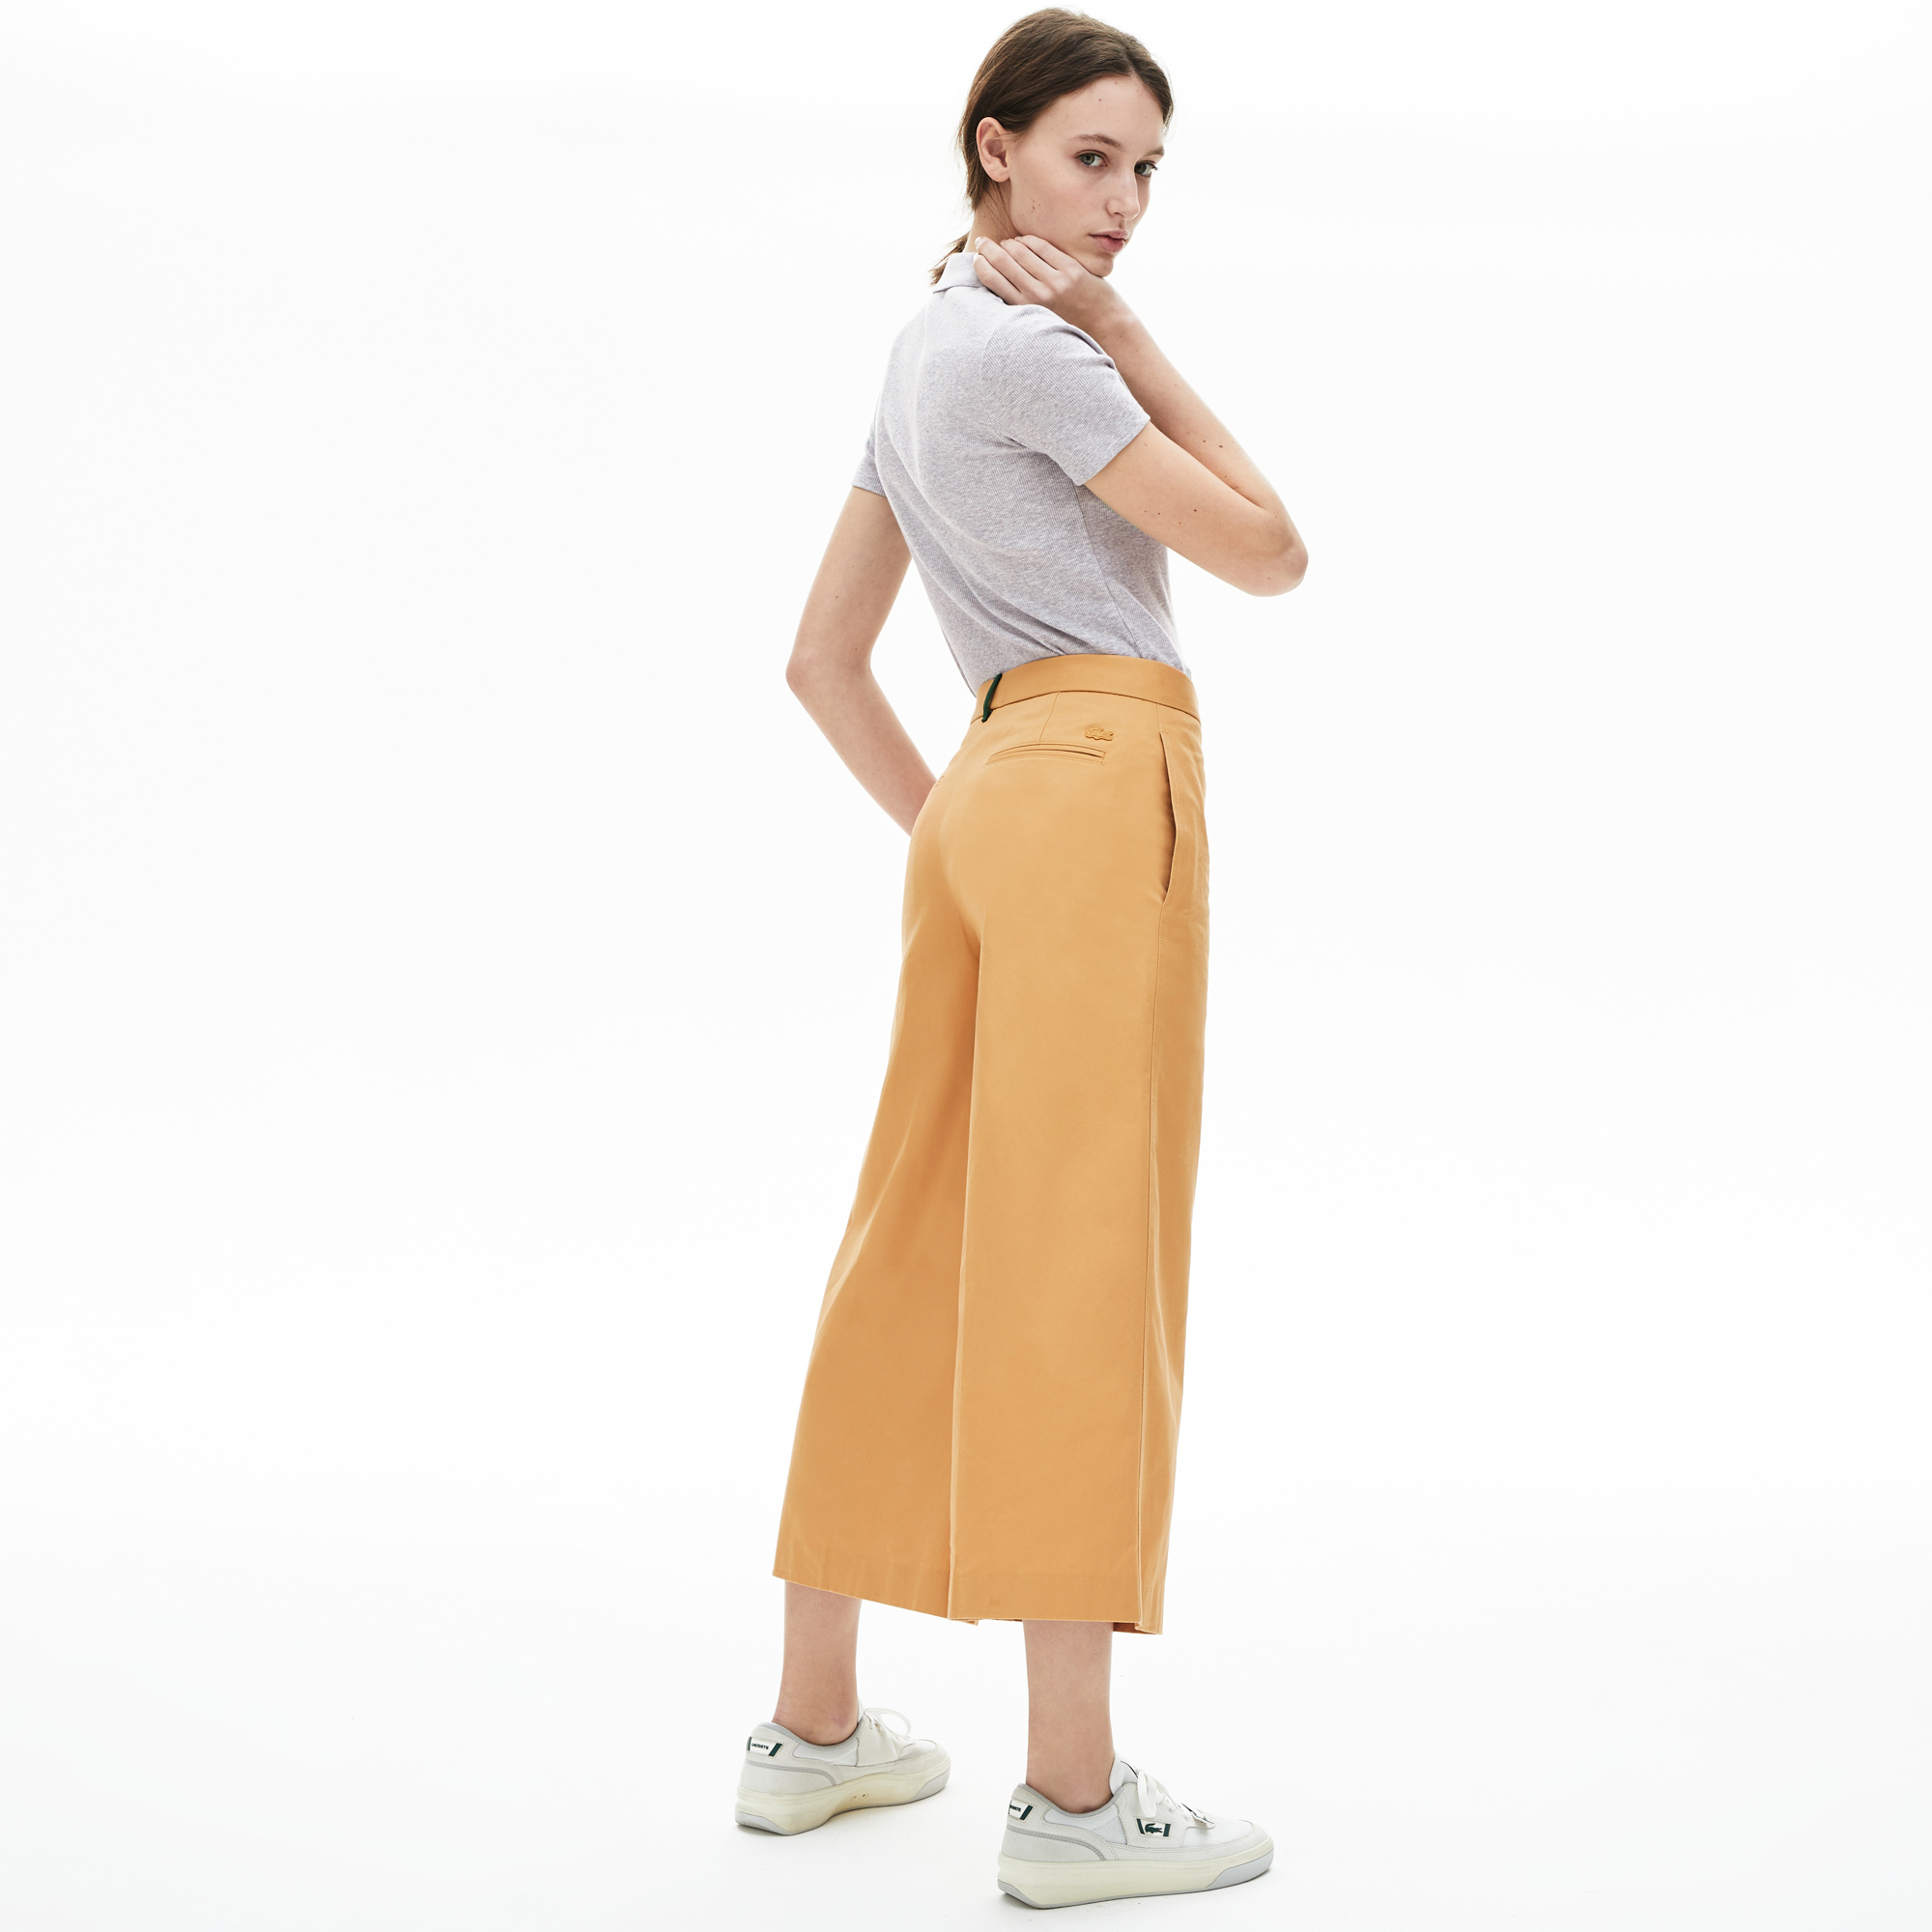 Lacoste Women's Ribbed Cotton Polo